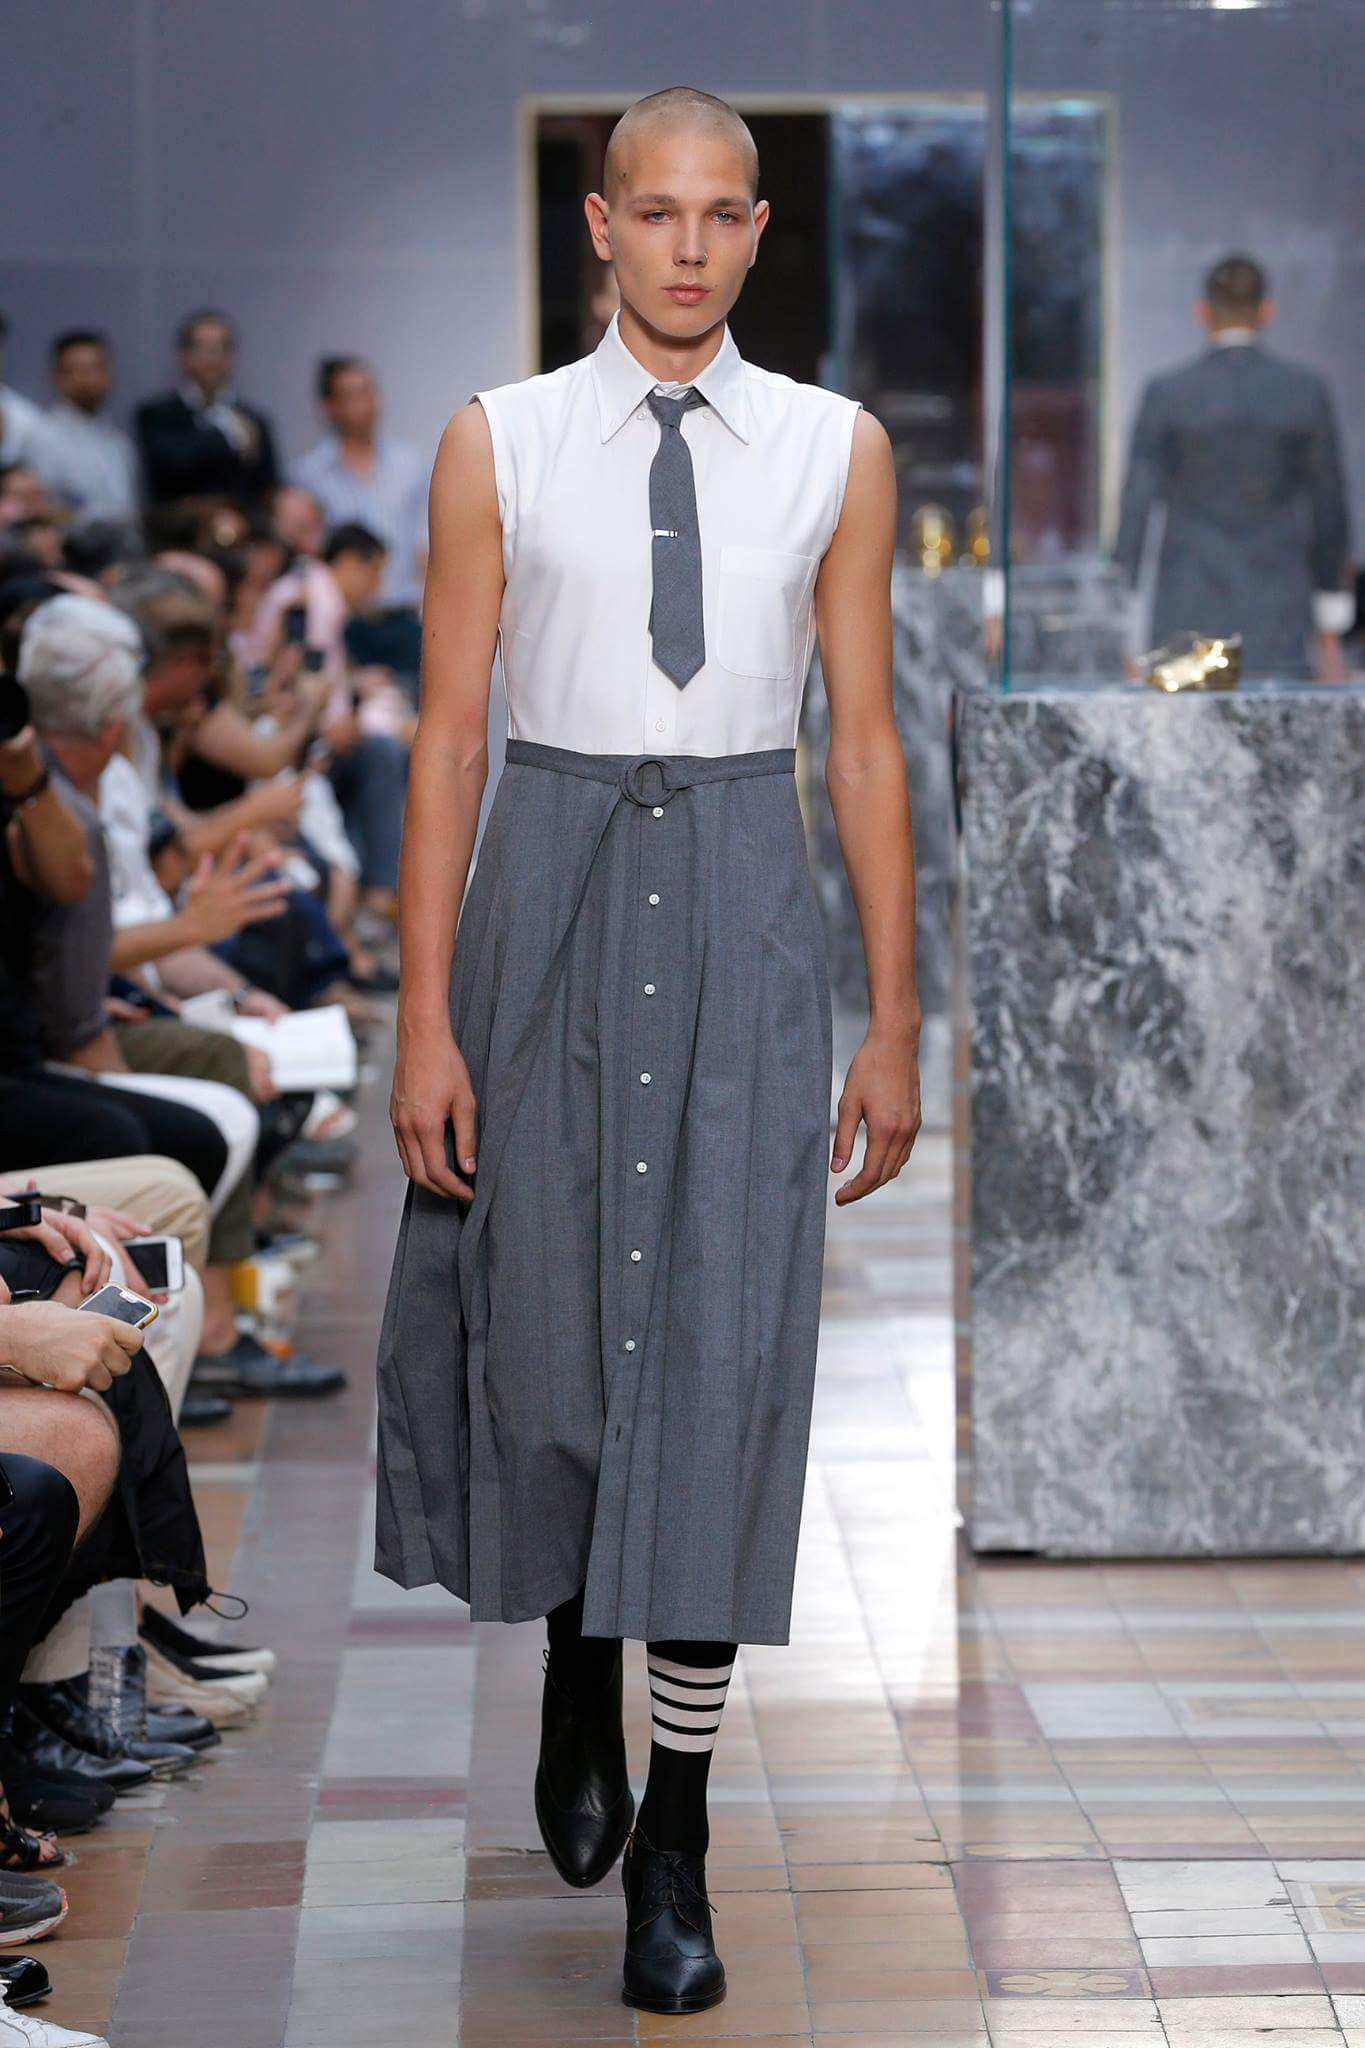 Trend Alert Dress Shirts Maxi dresses Pleated Skirts and High Heels For Men  SatisFashion Uganda